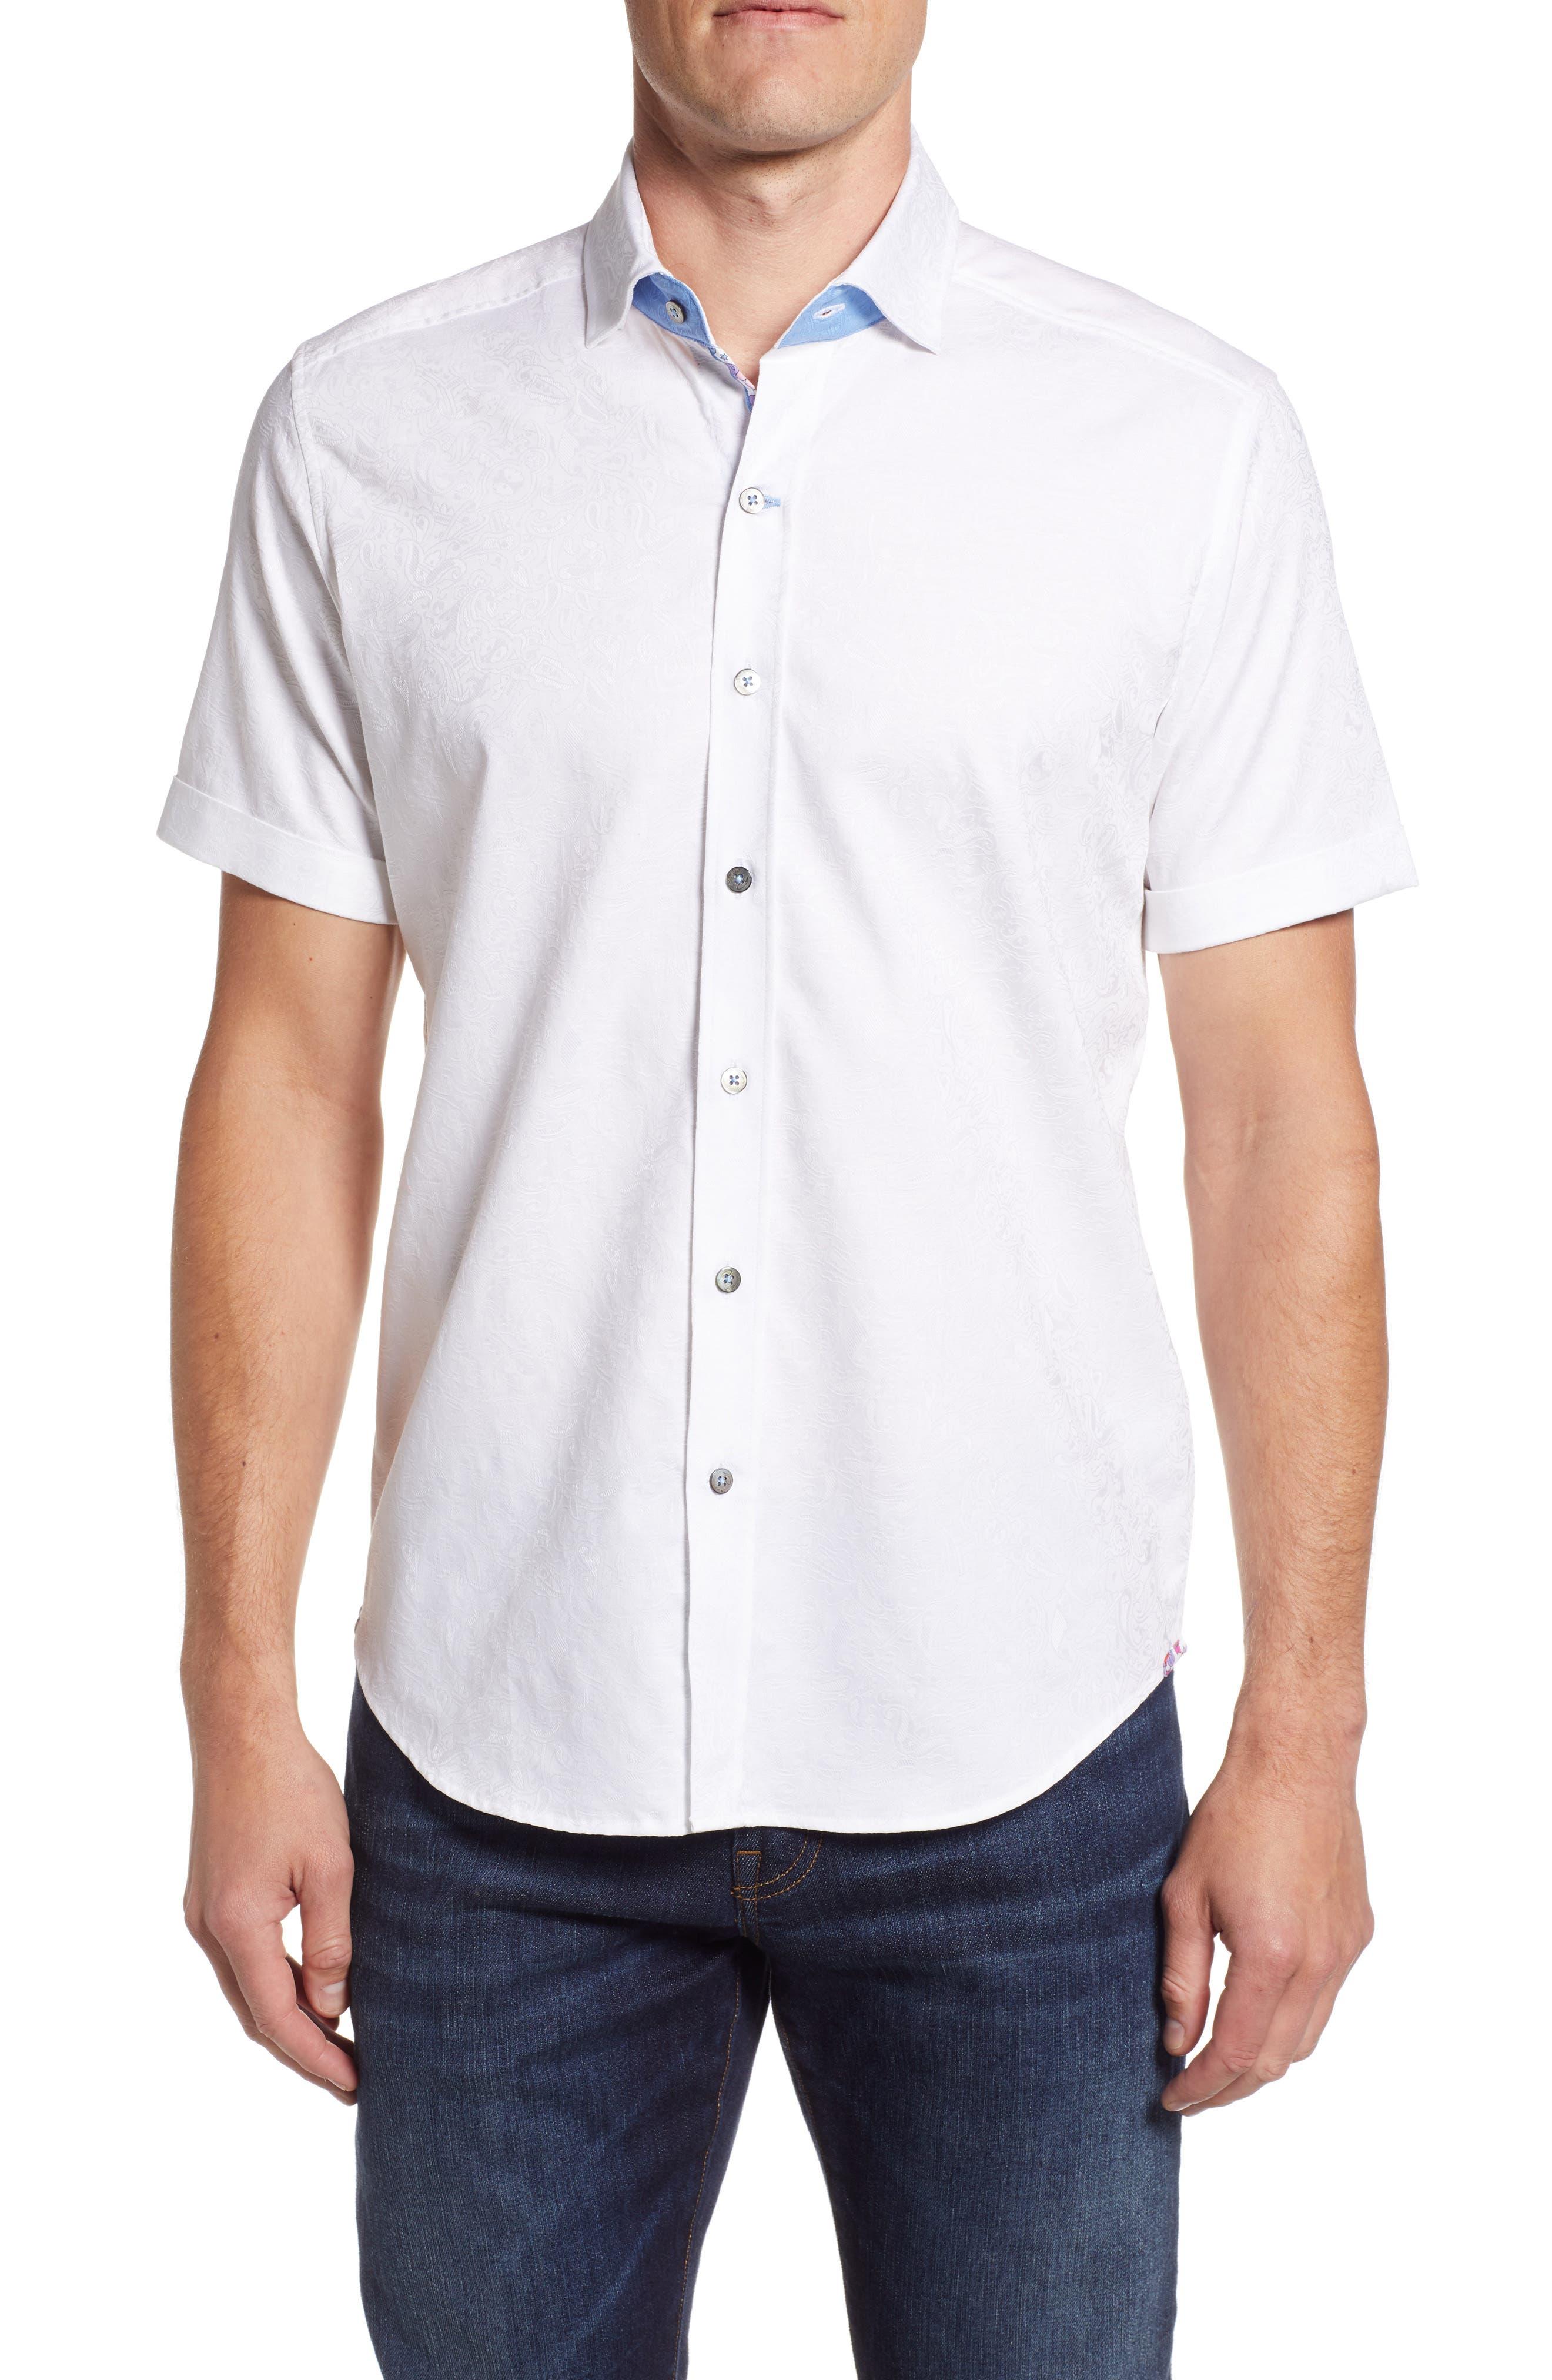 Abbott Sport Shirt,                             Main thumbnail 1, color,                             White